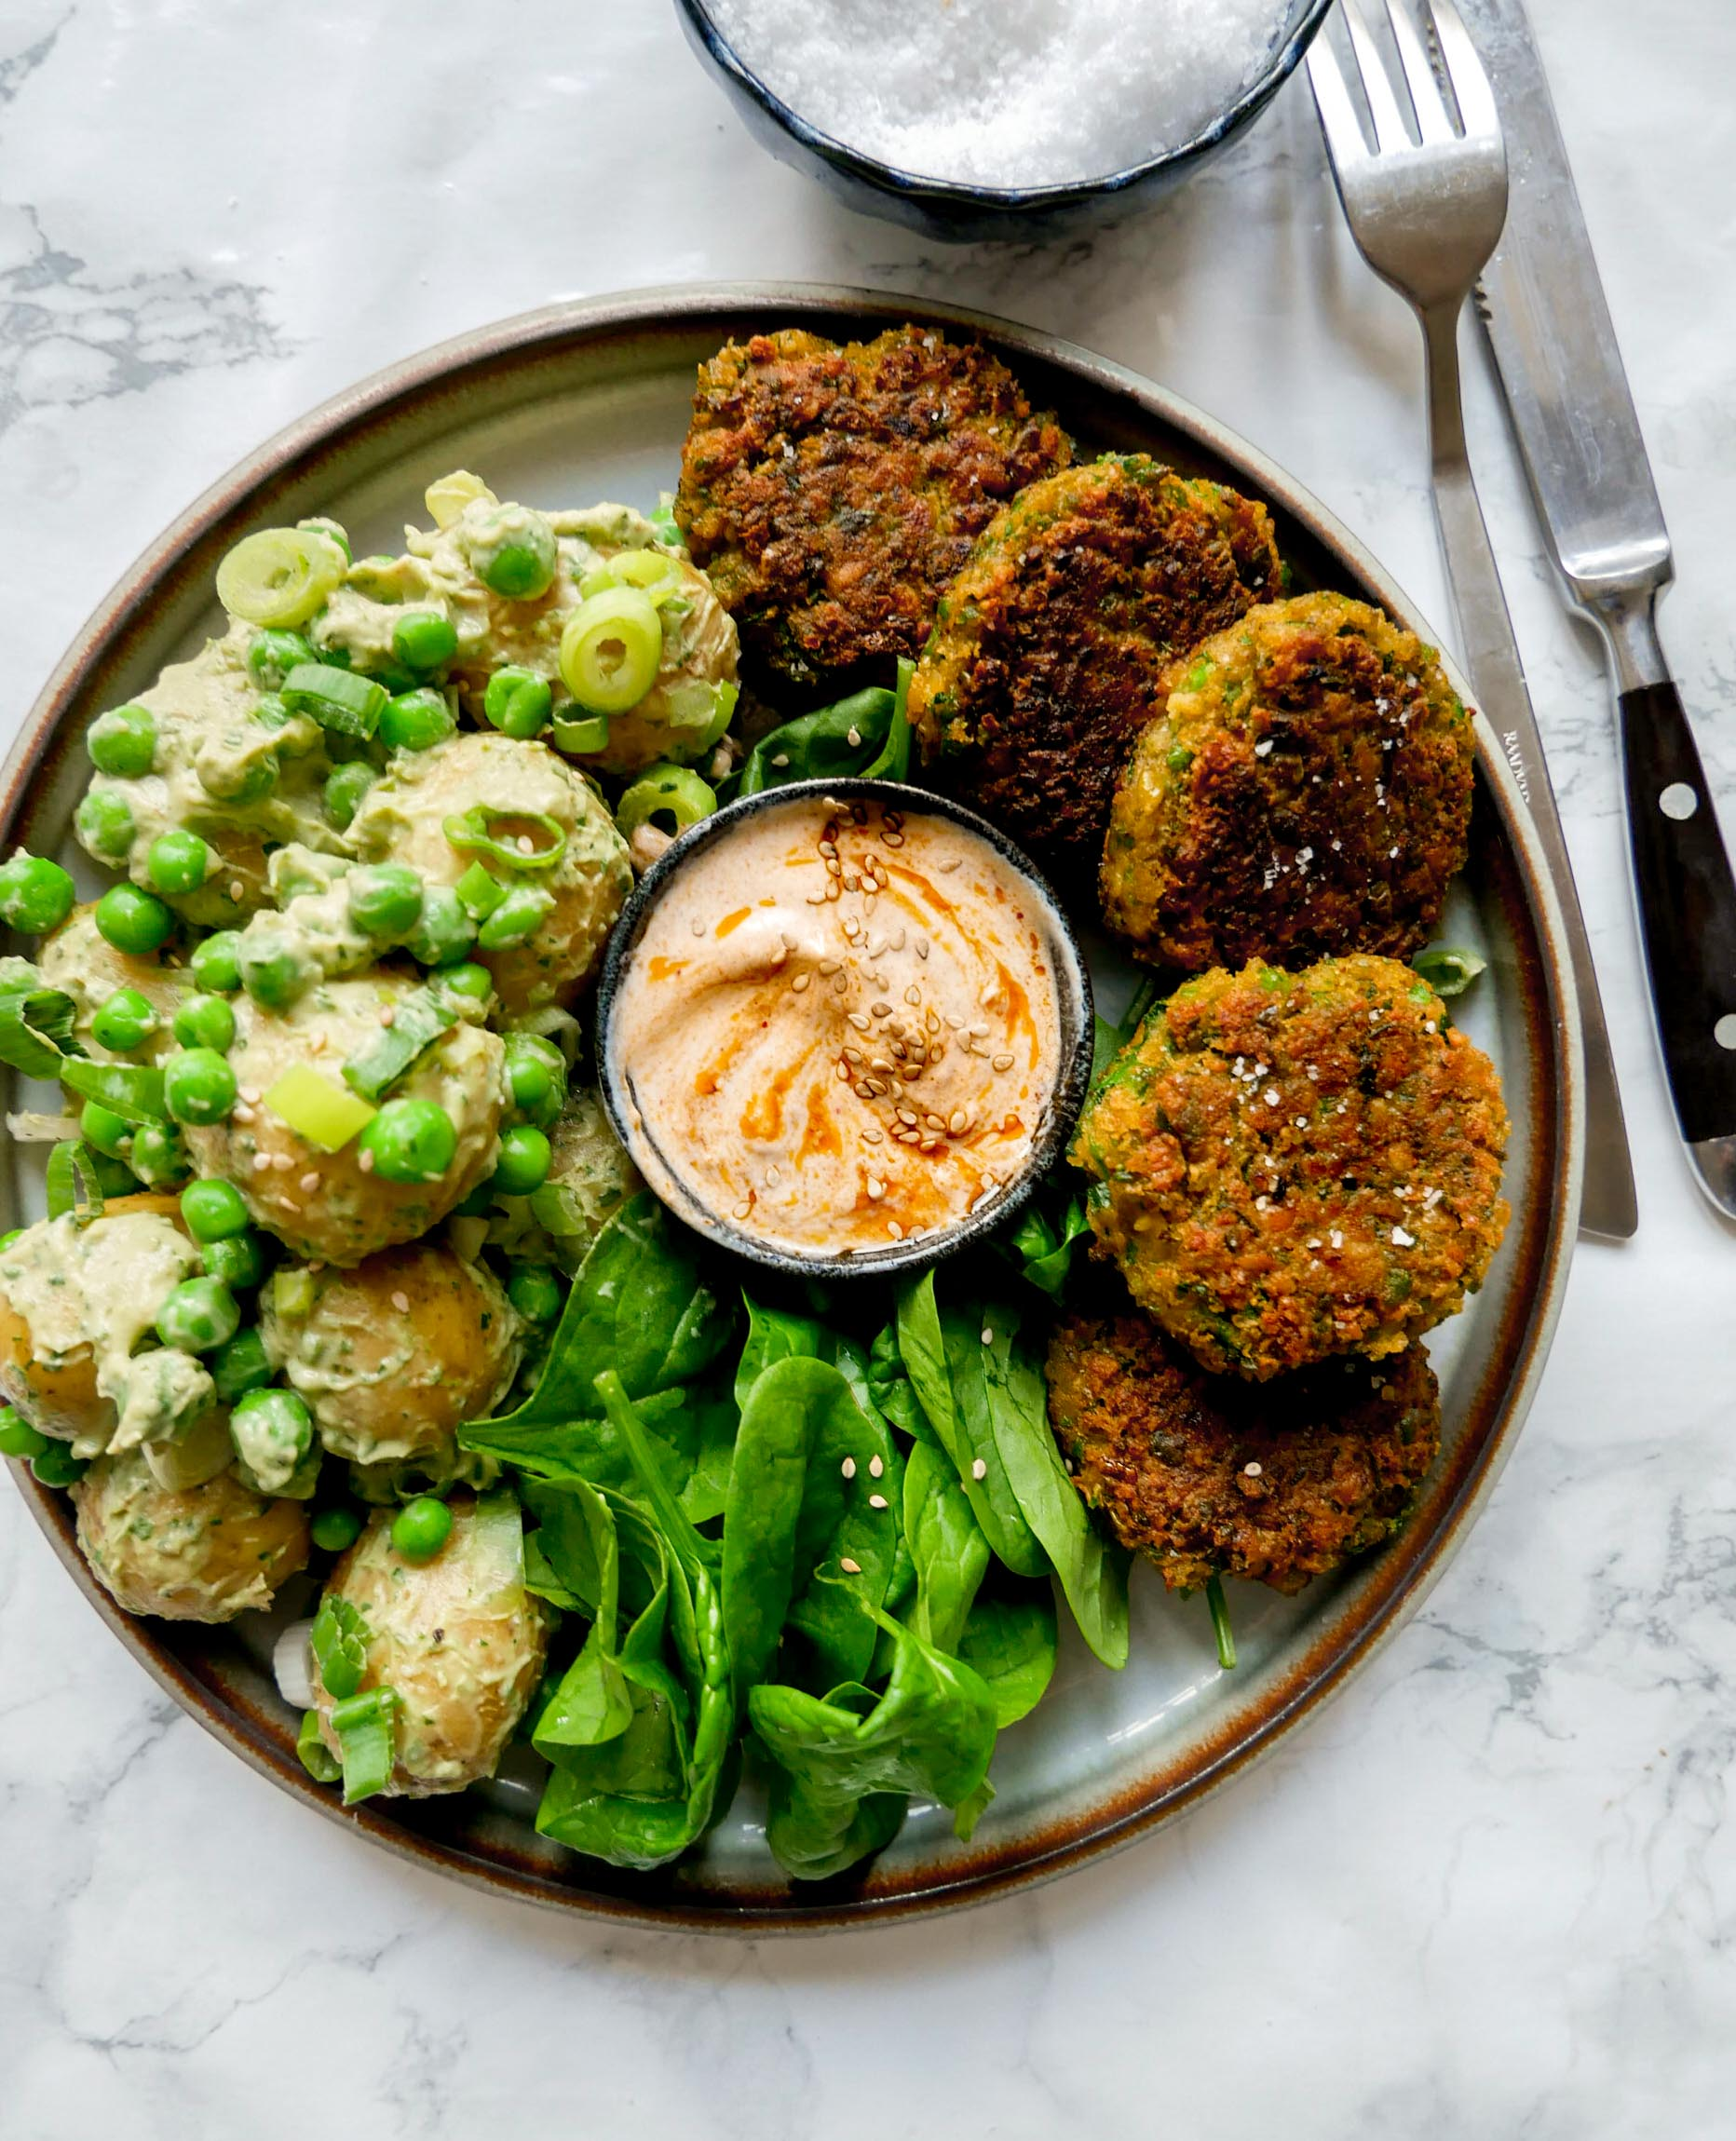 vegan bowls with potato salad and patty